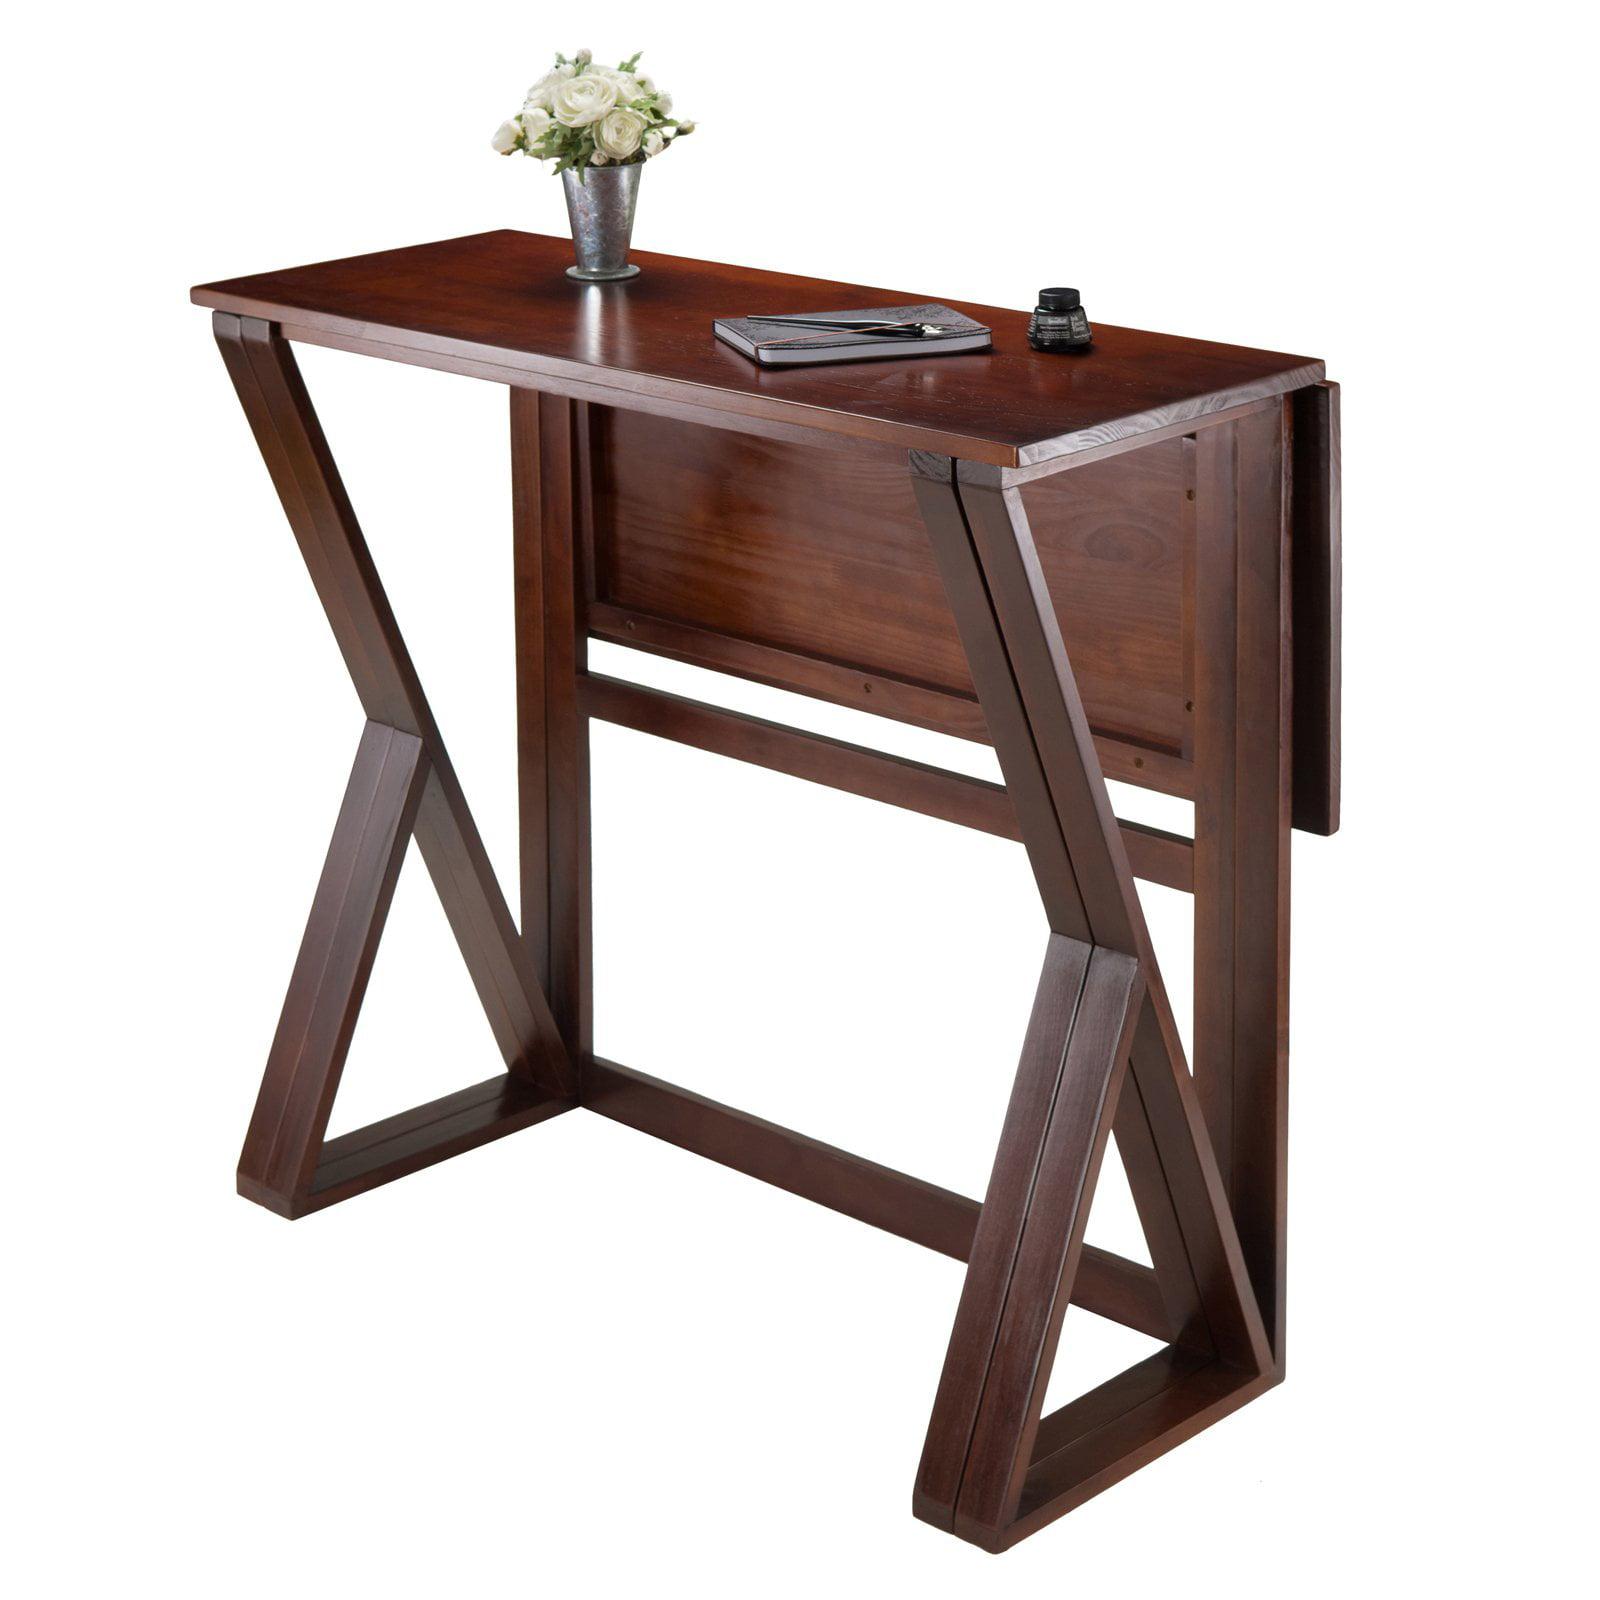 Harrington Drop Leaf High Table, Walnut - Walmart.com